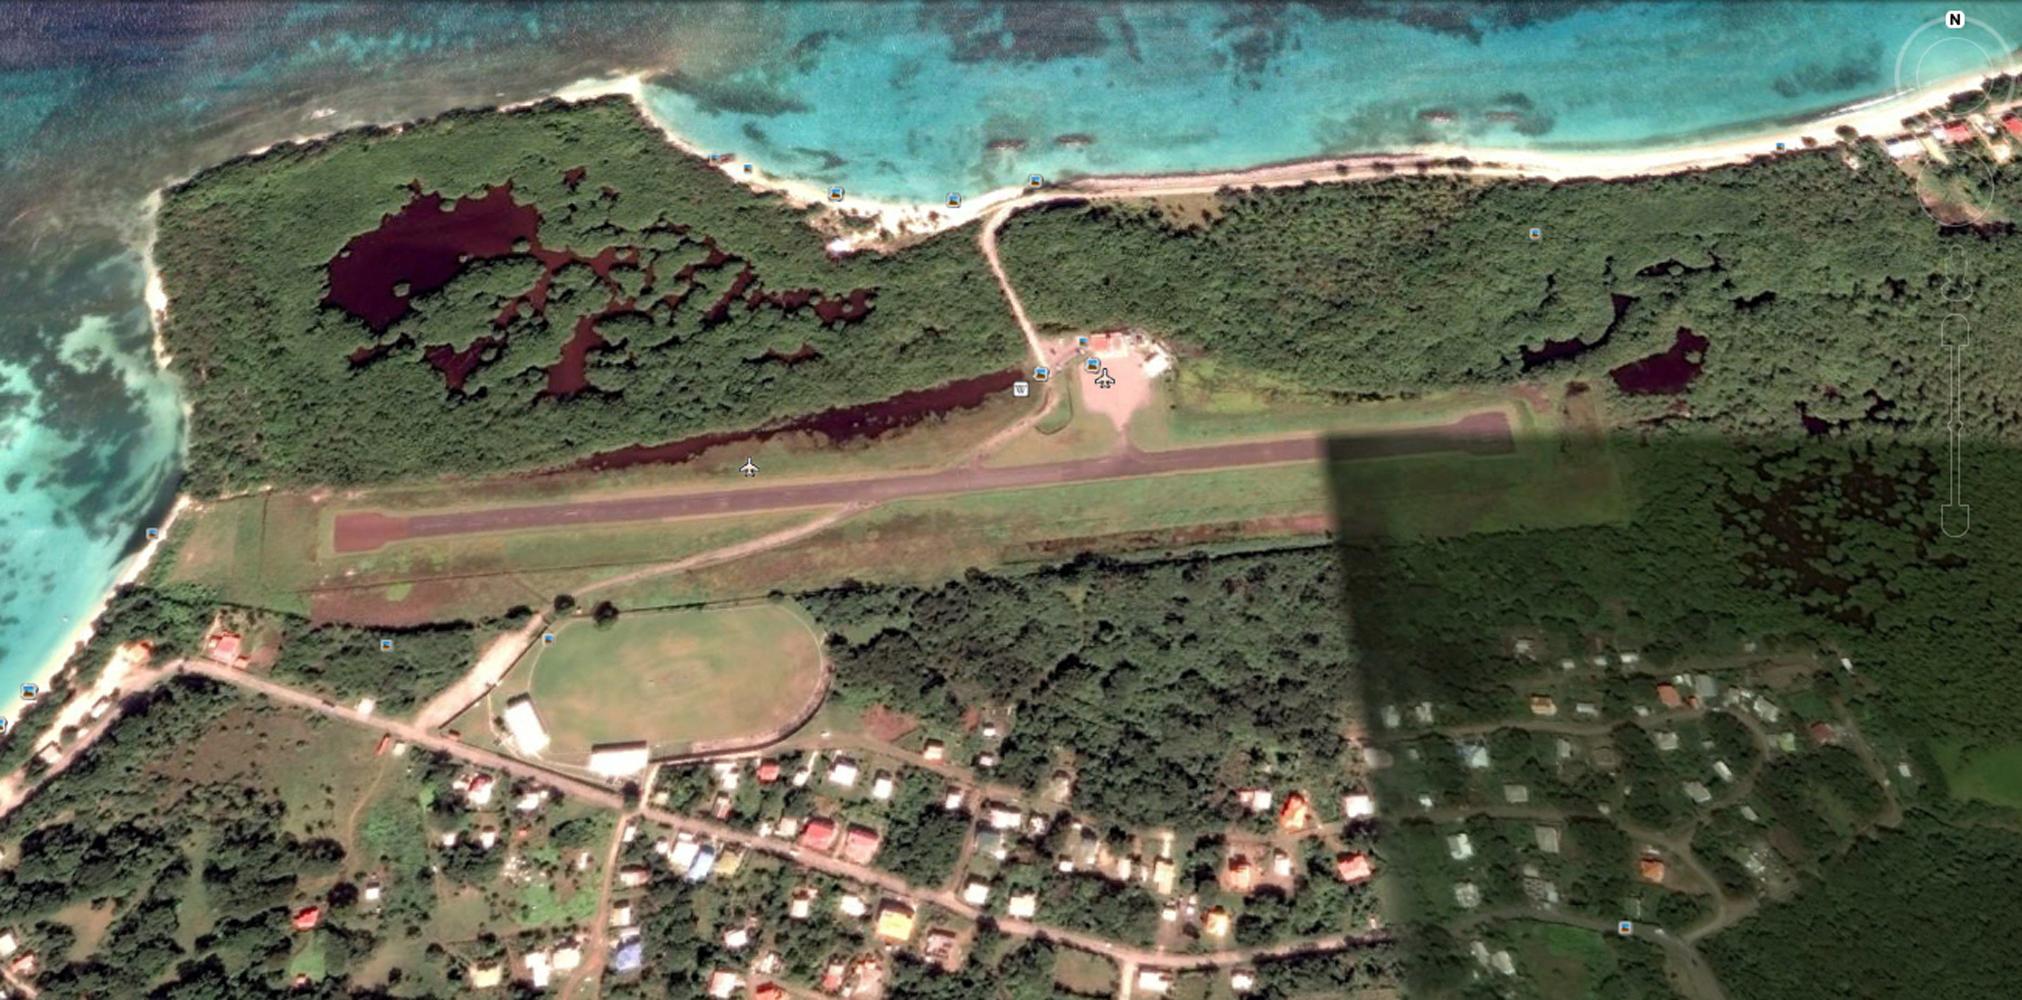 Lauriston Airport, Carriacou, Grenada. Image: Google Earth